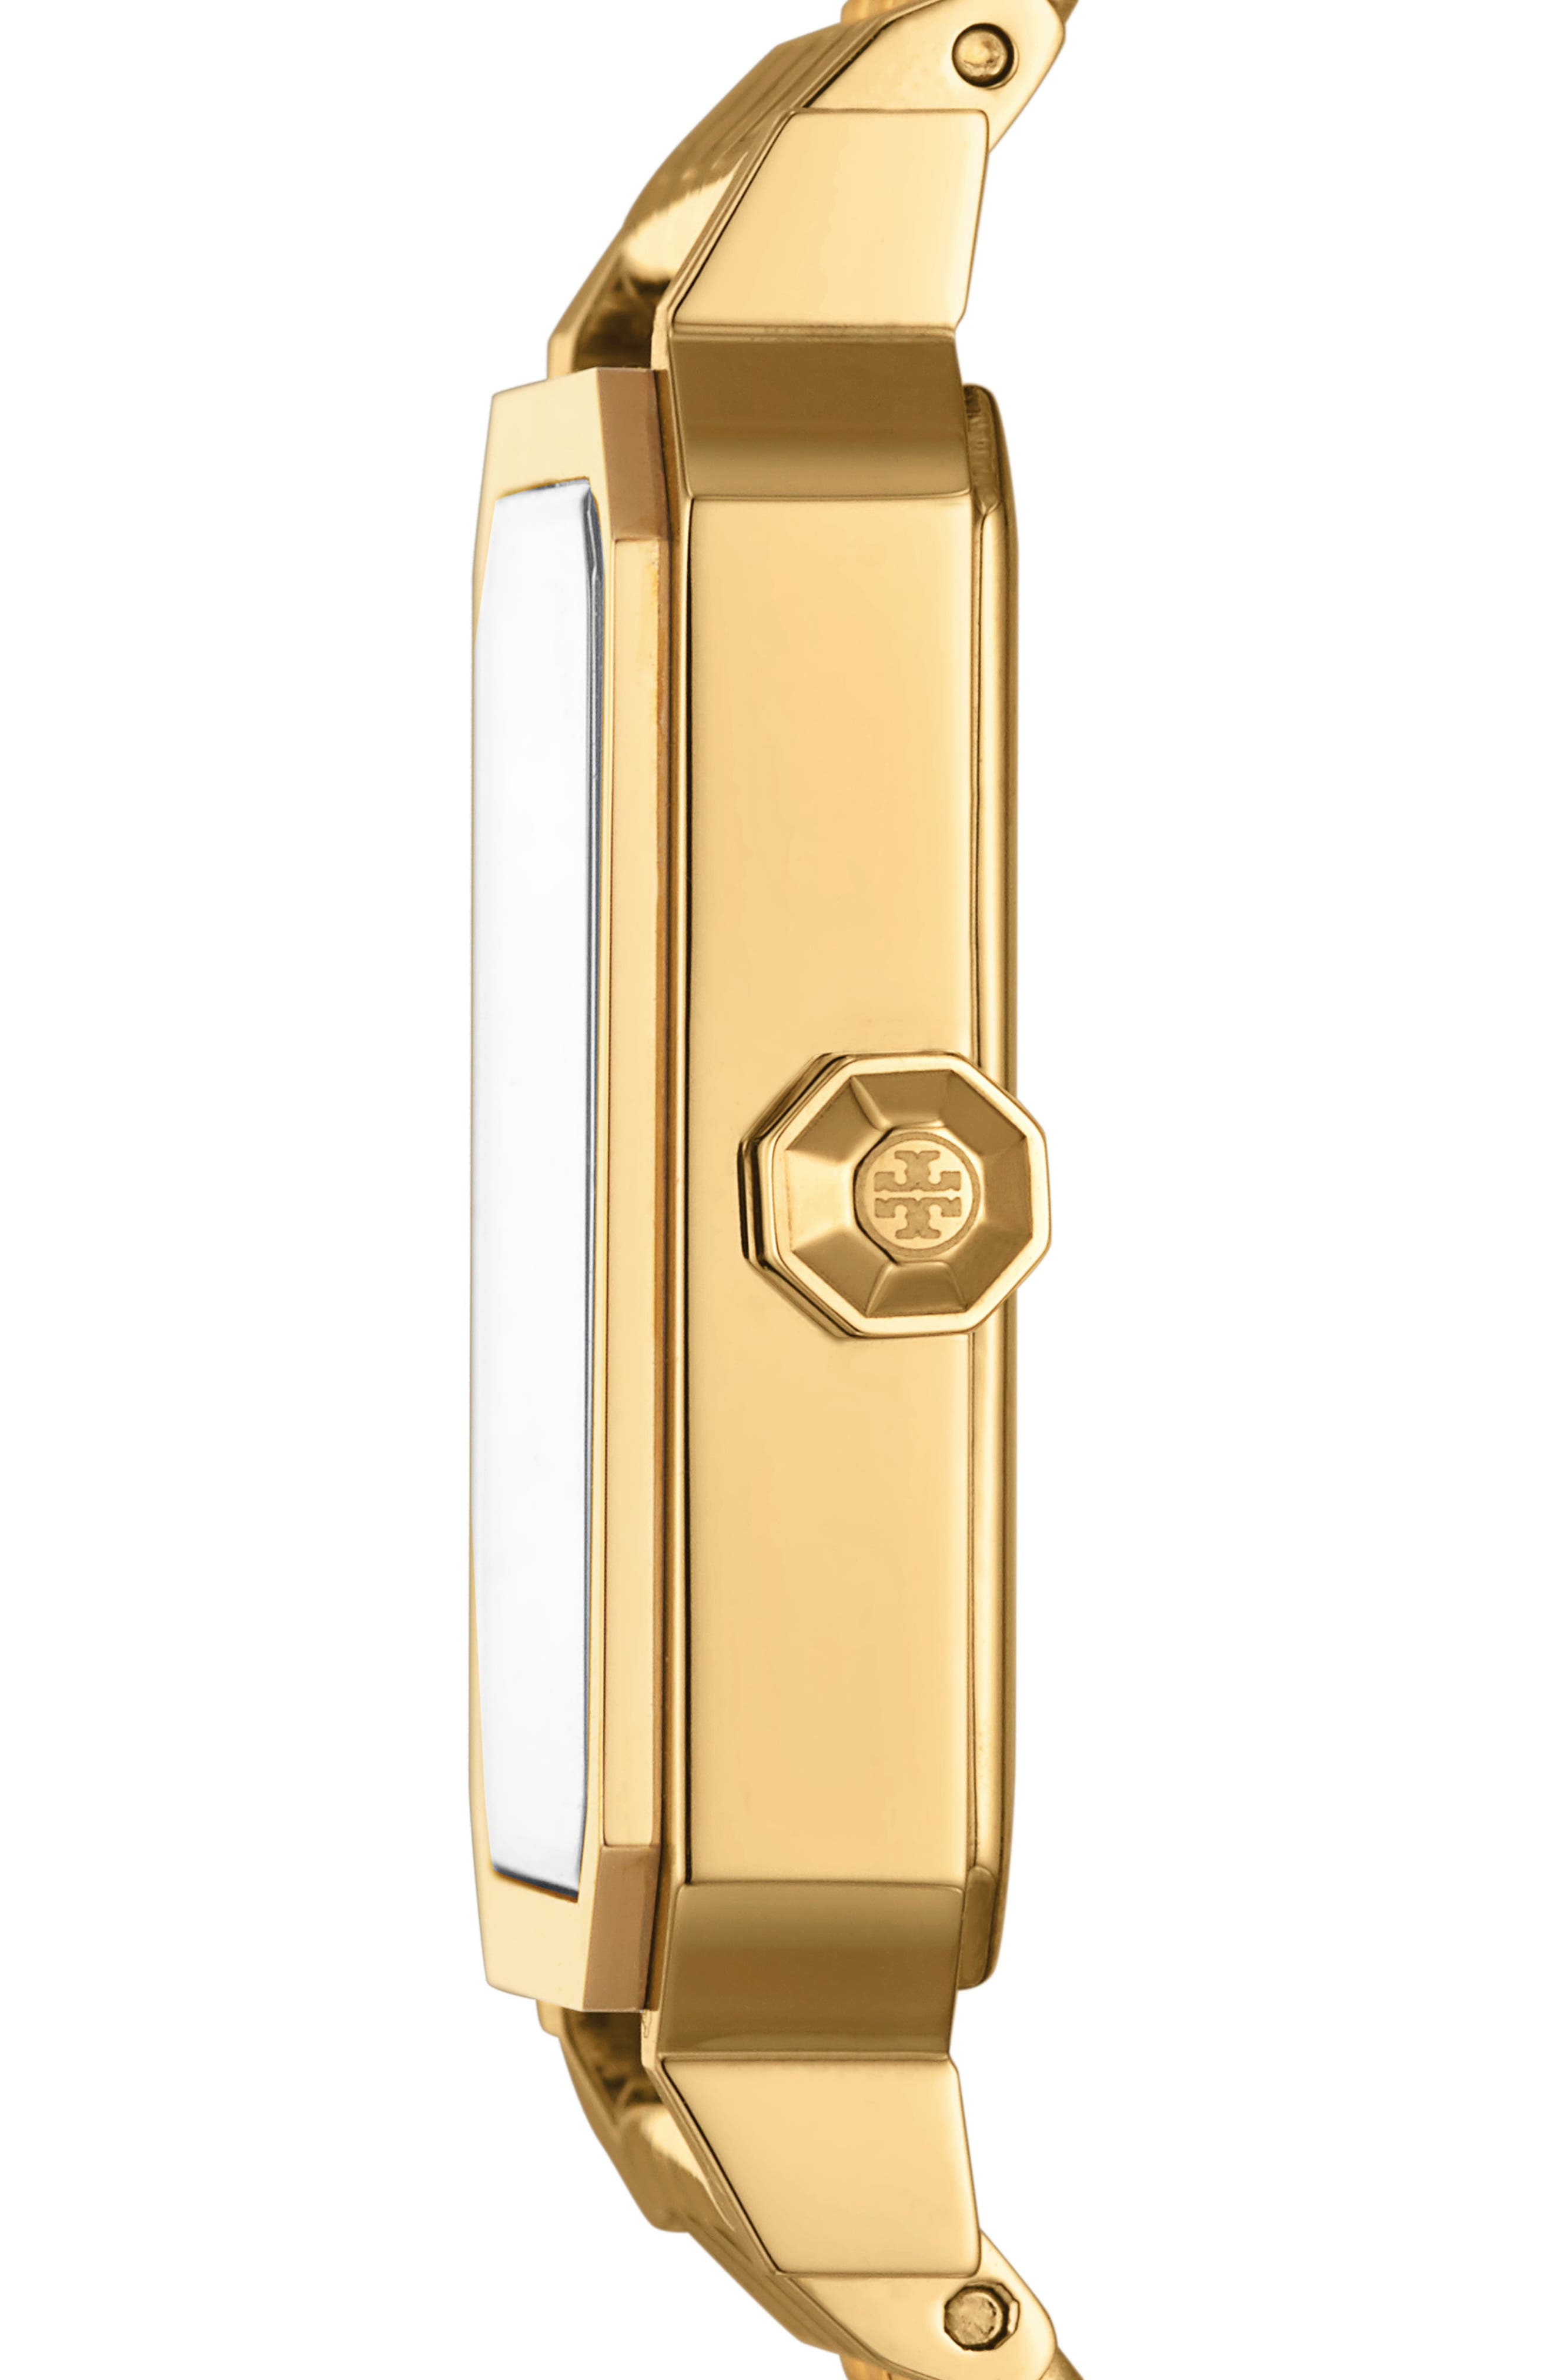 TORY BURCH, Robinson Mesh Bracelet Watch, 27mm x 29mm, Alternate thumbnail 2, color, GOLD/ WHITE / GOLD